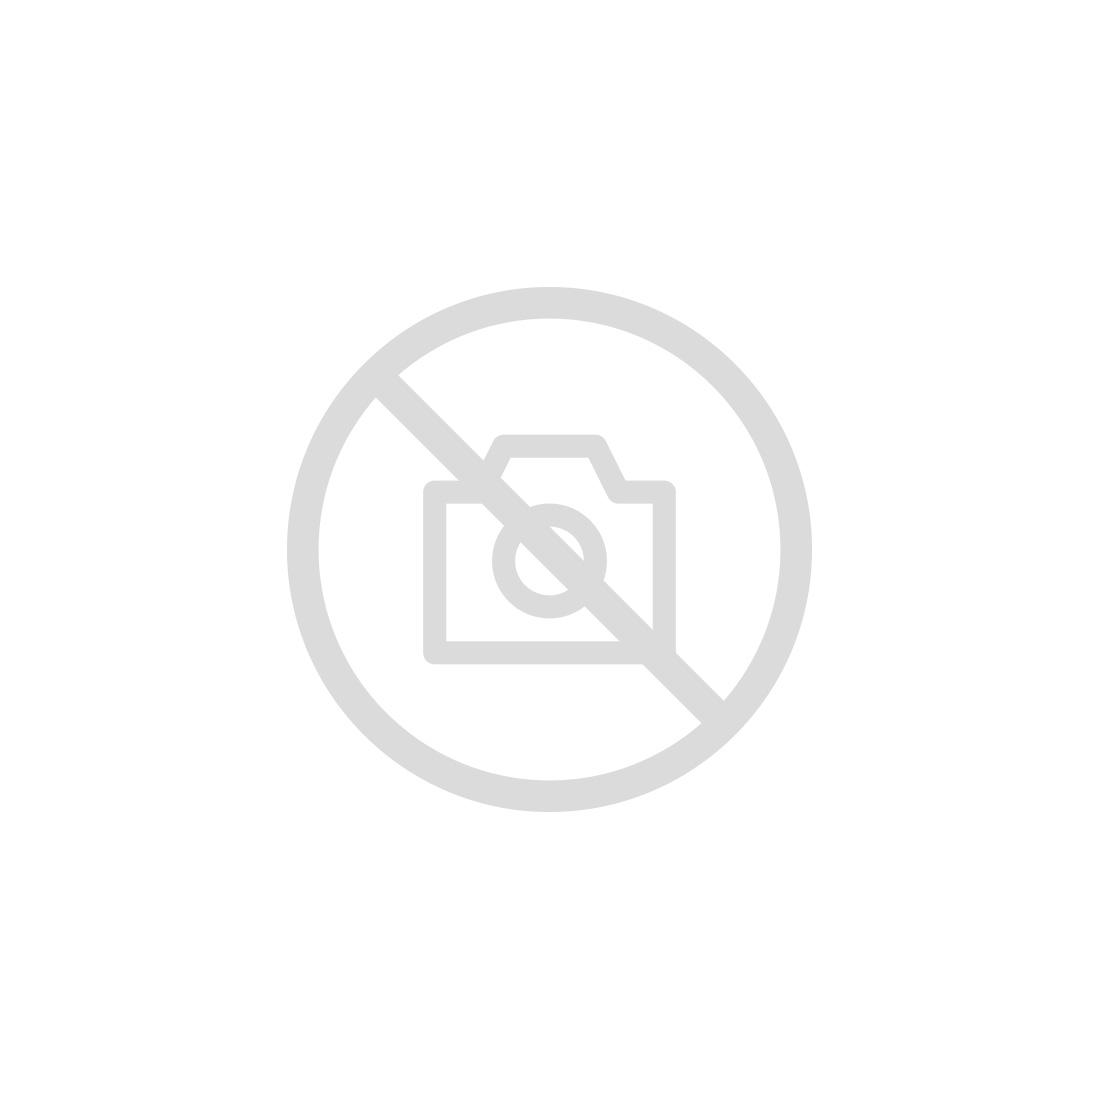 Bose QuietComfort 35 II Wireless ausinės